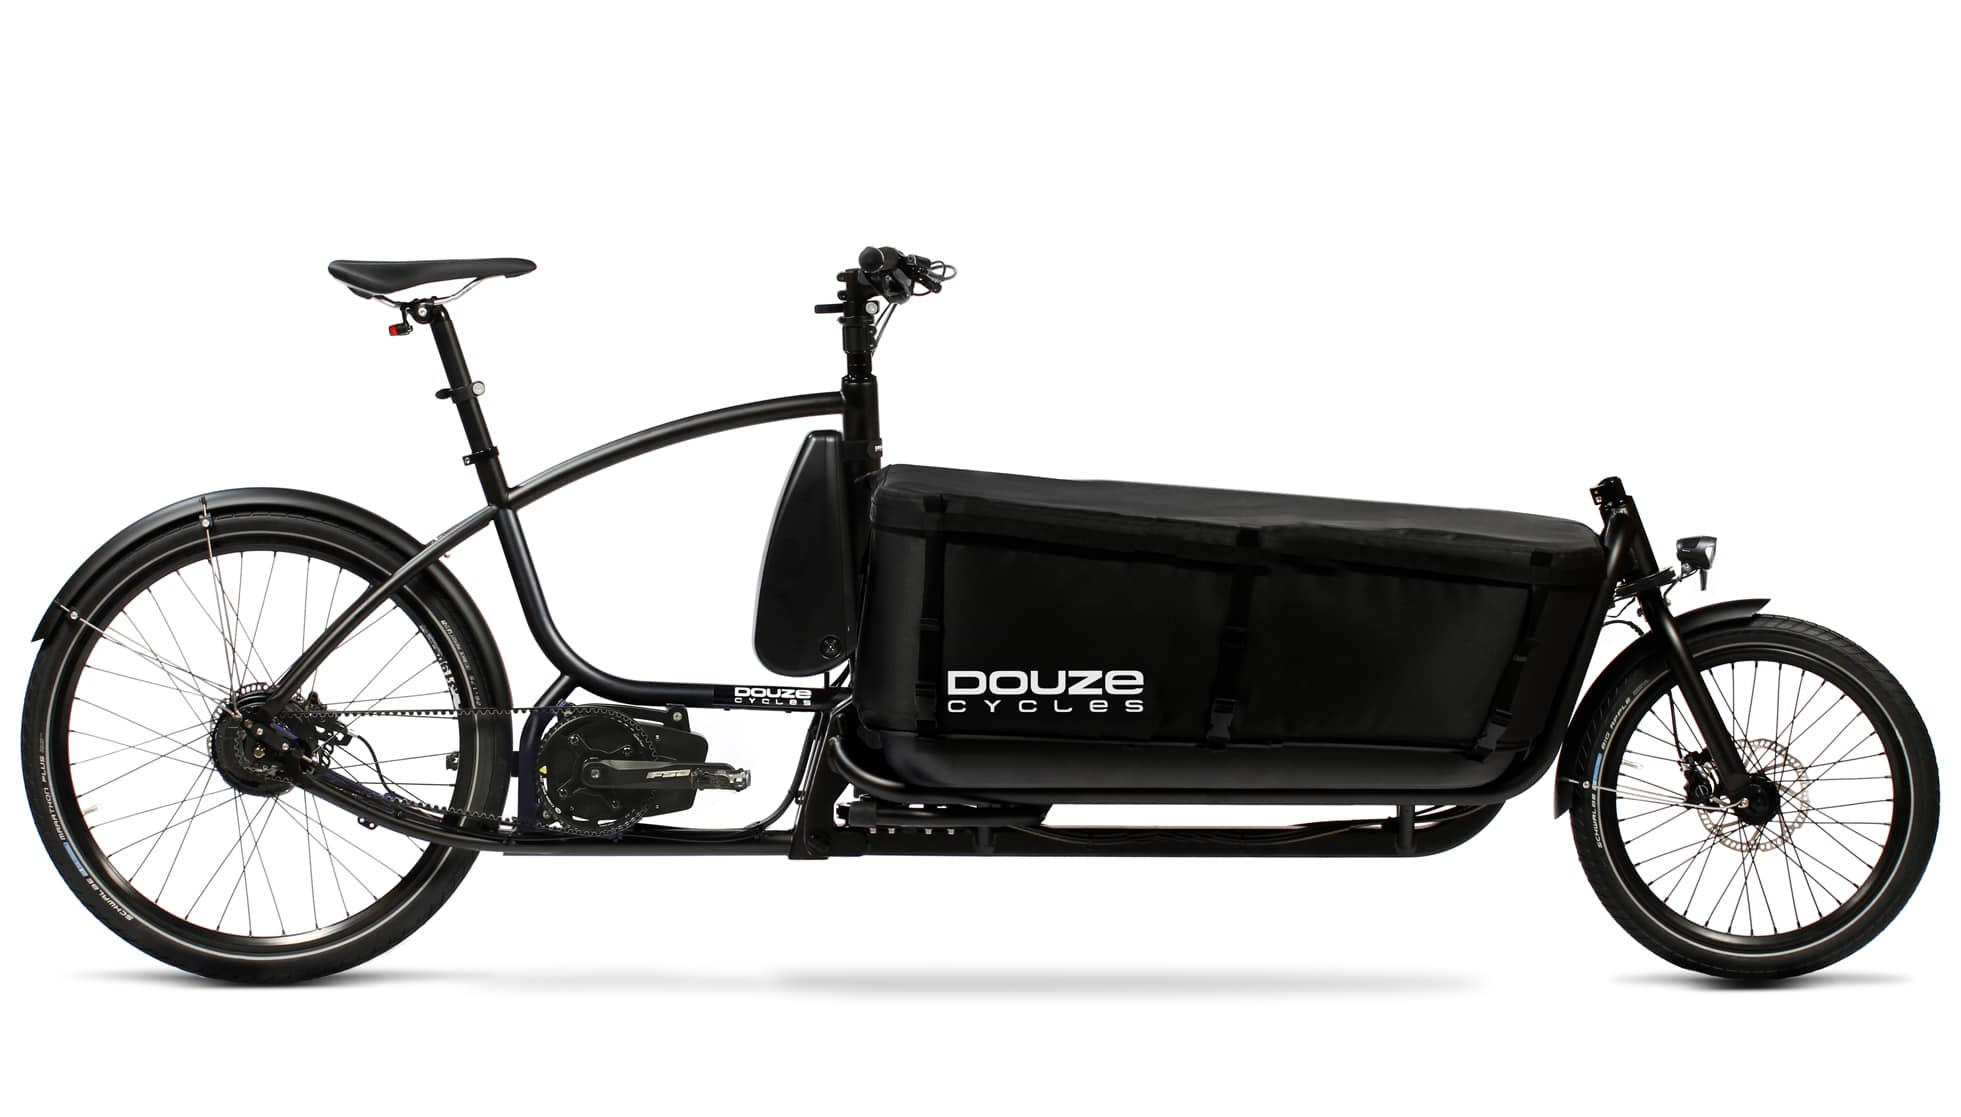 Vélo cargo biporteur électrique DOUZE CYCLE V2 Shimano Velab